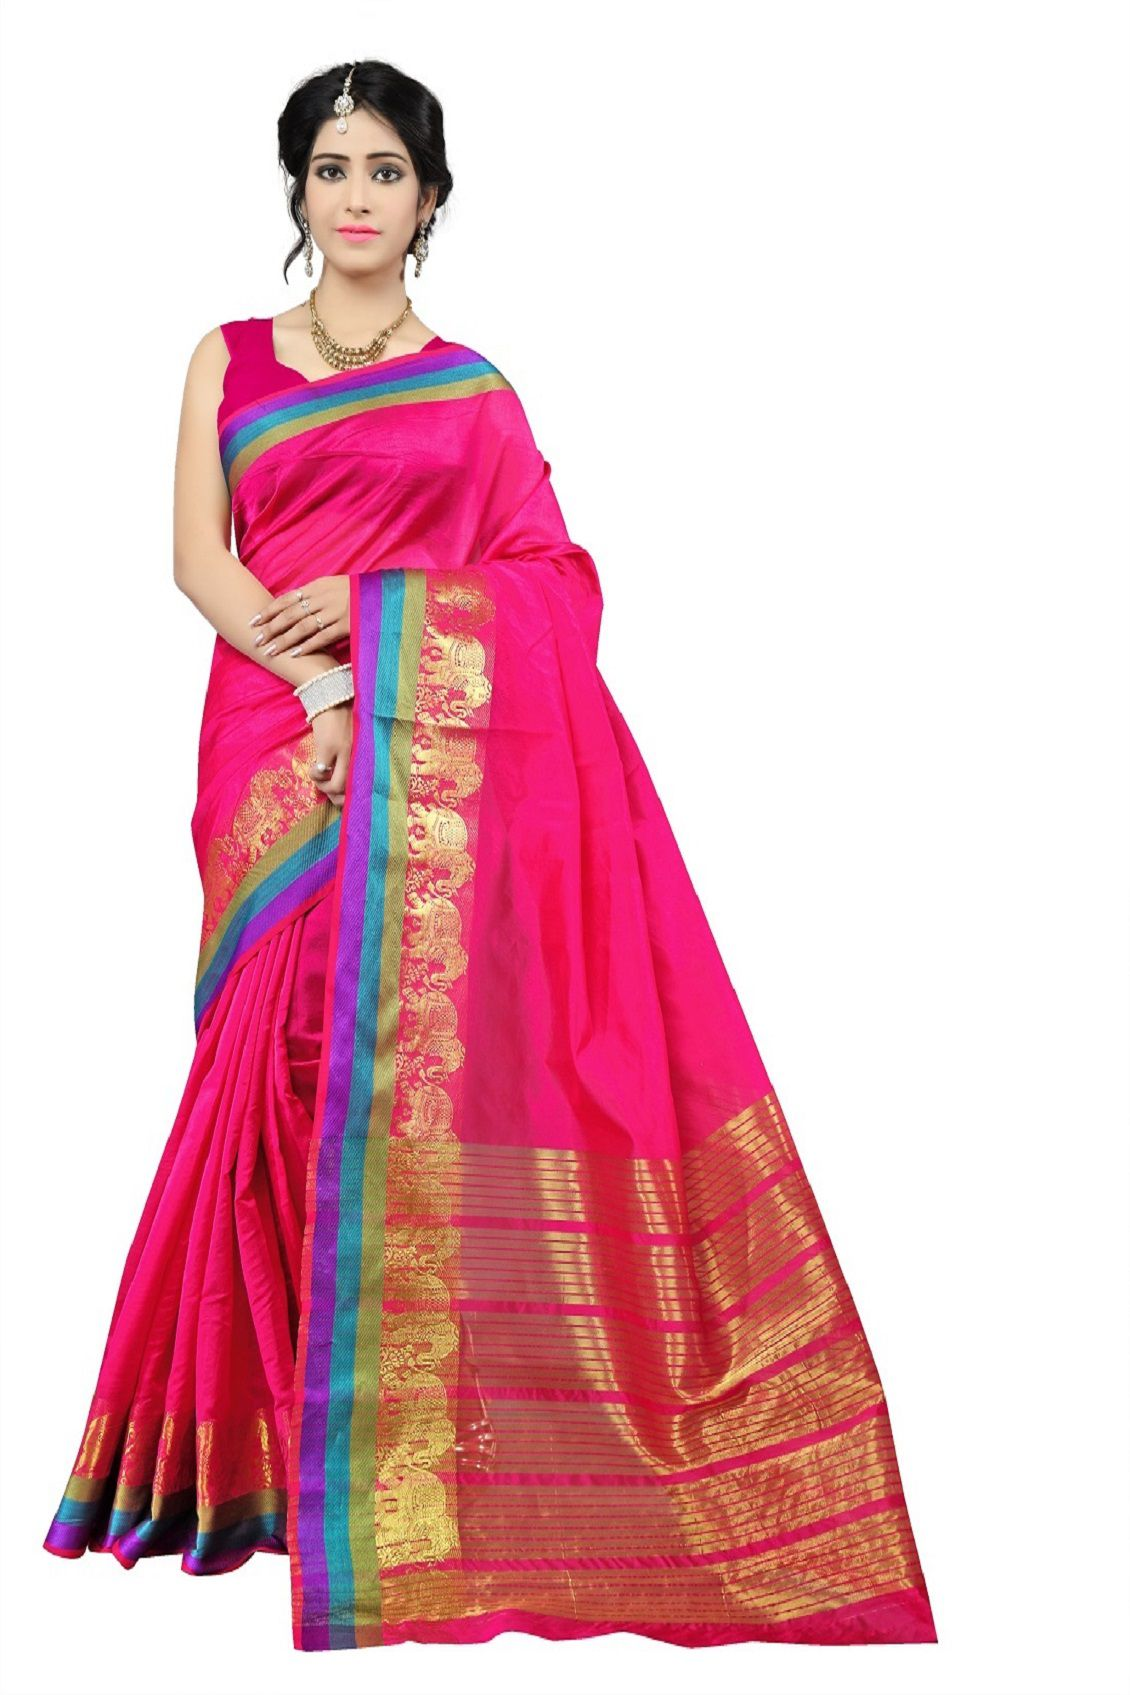 f2d7e5ff1b52b7 Mahadev Enterprises Red and Pink Banarasi Silk Saree - Buy Mahadev  Enterprises Red and Pink Banarasi Silk Saree Online at Low Price -  Snapdeal.com